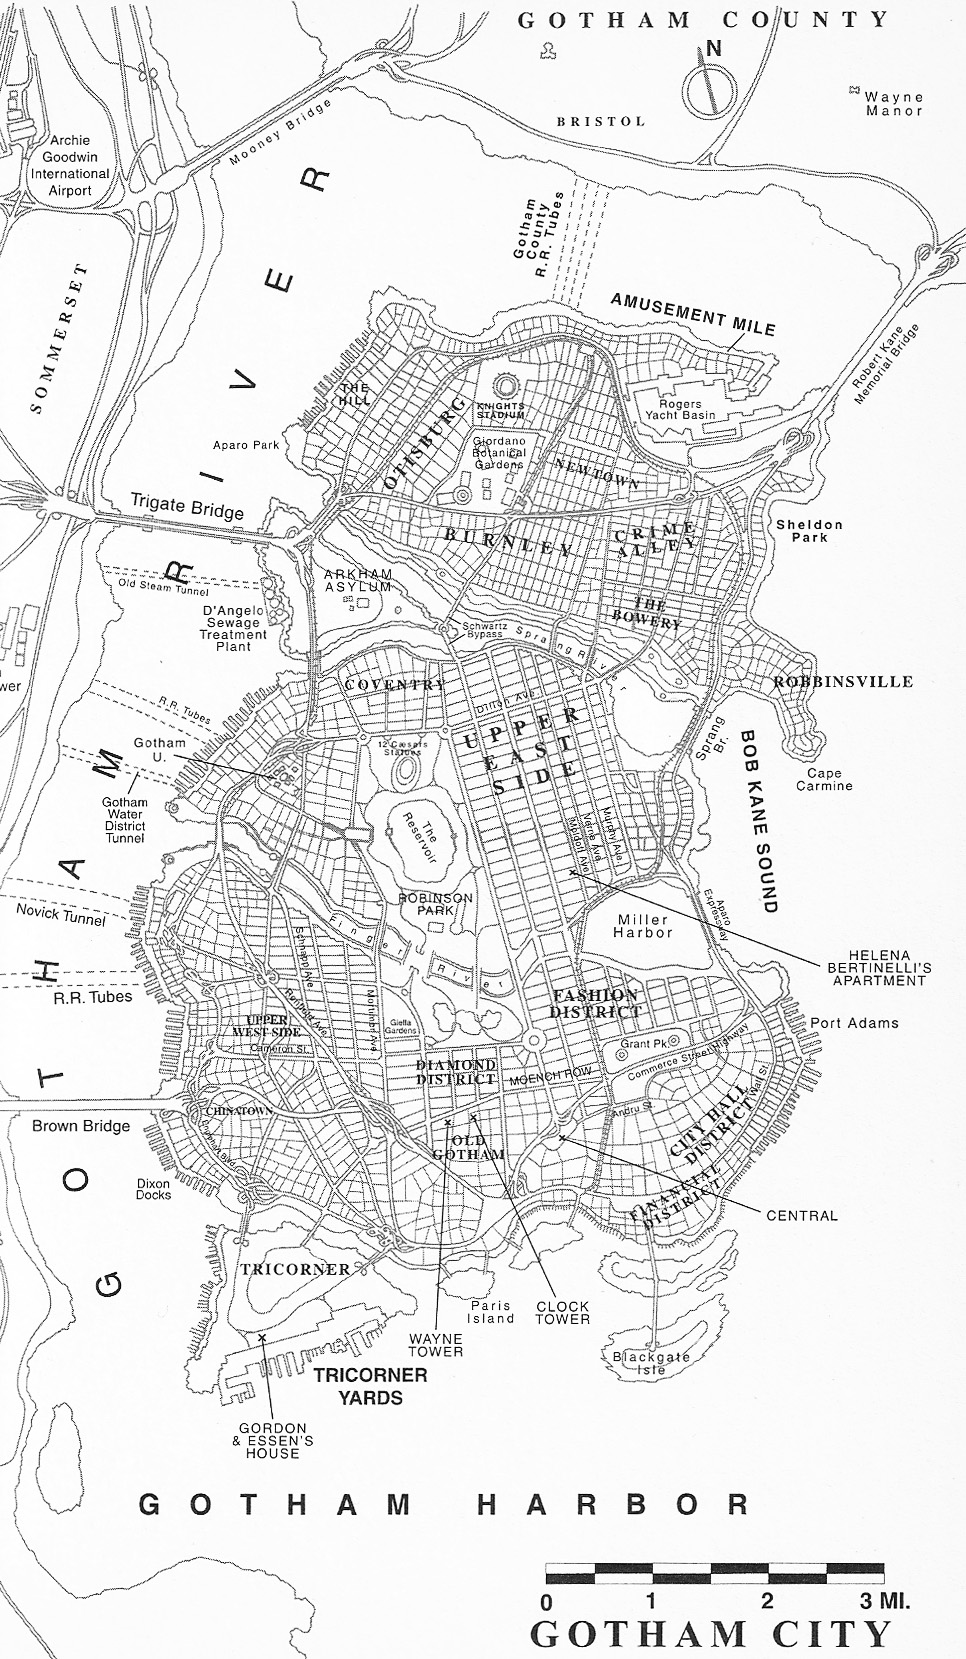 Gotham City Map: The Cartographer of Gotham